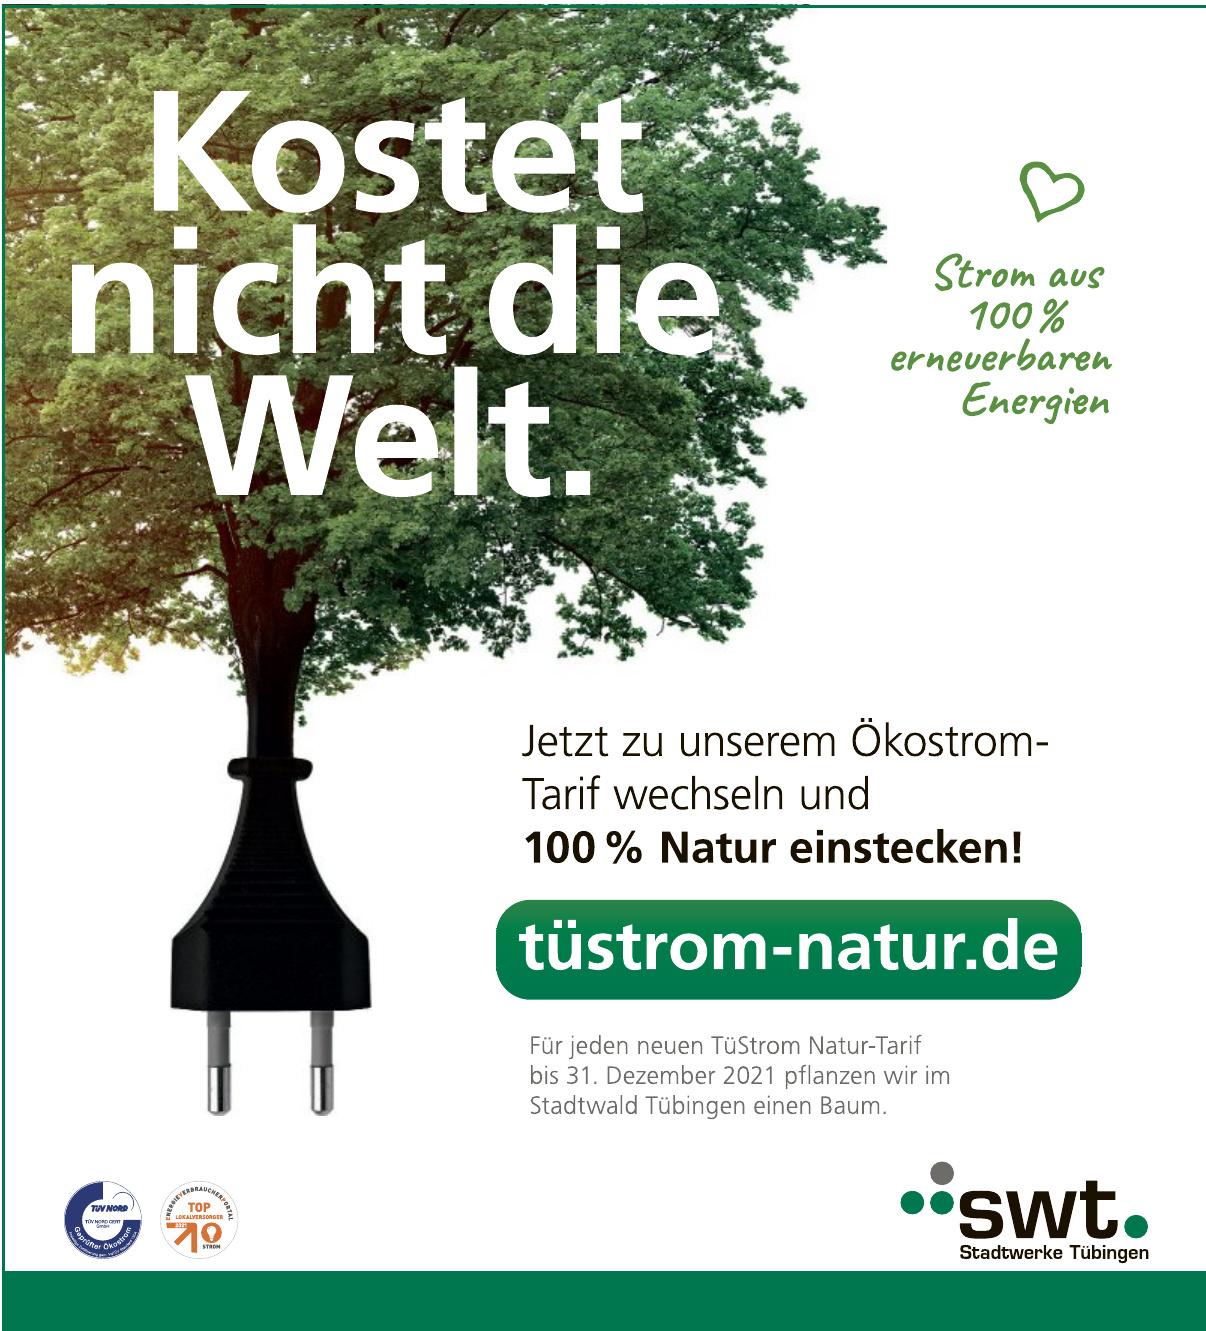 SWT Stadtwerke Tübingen